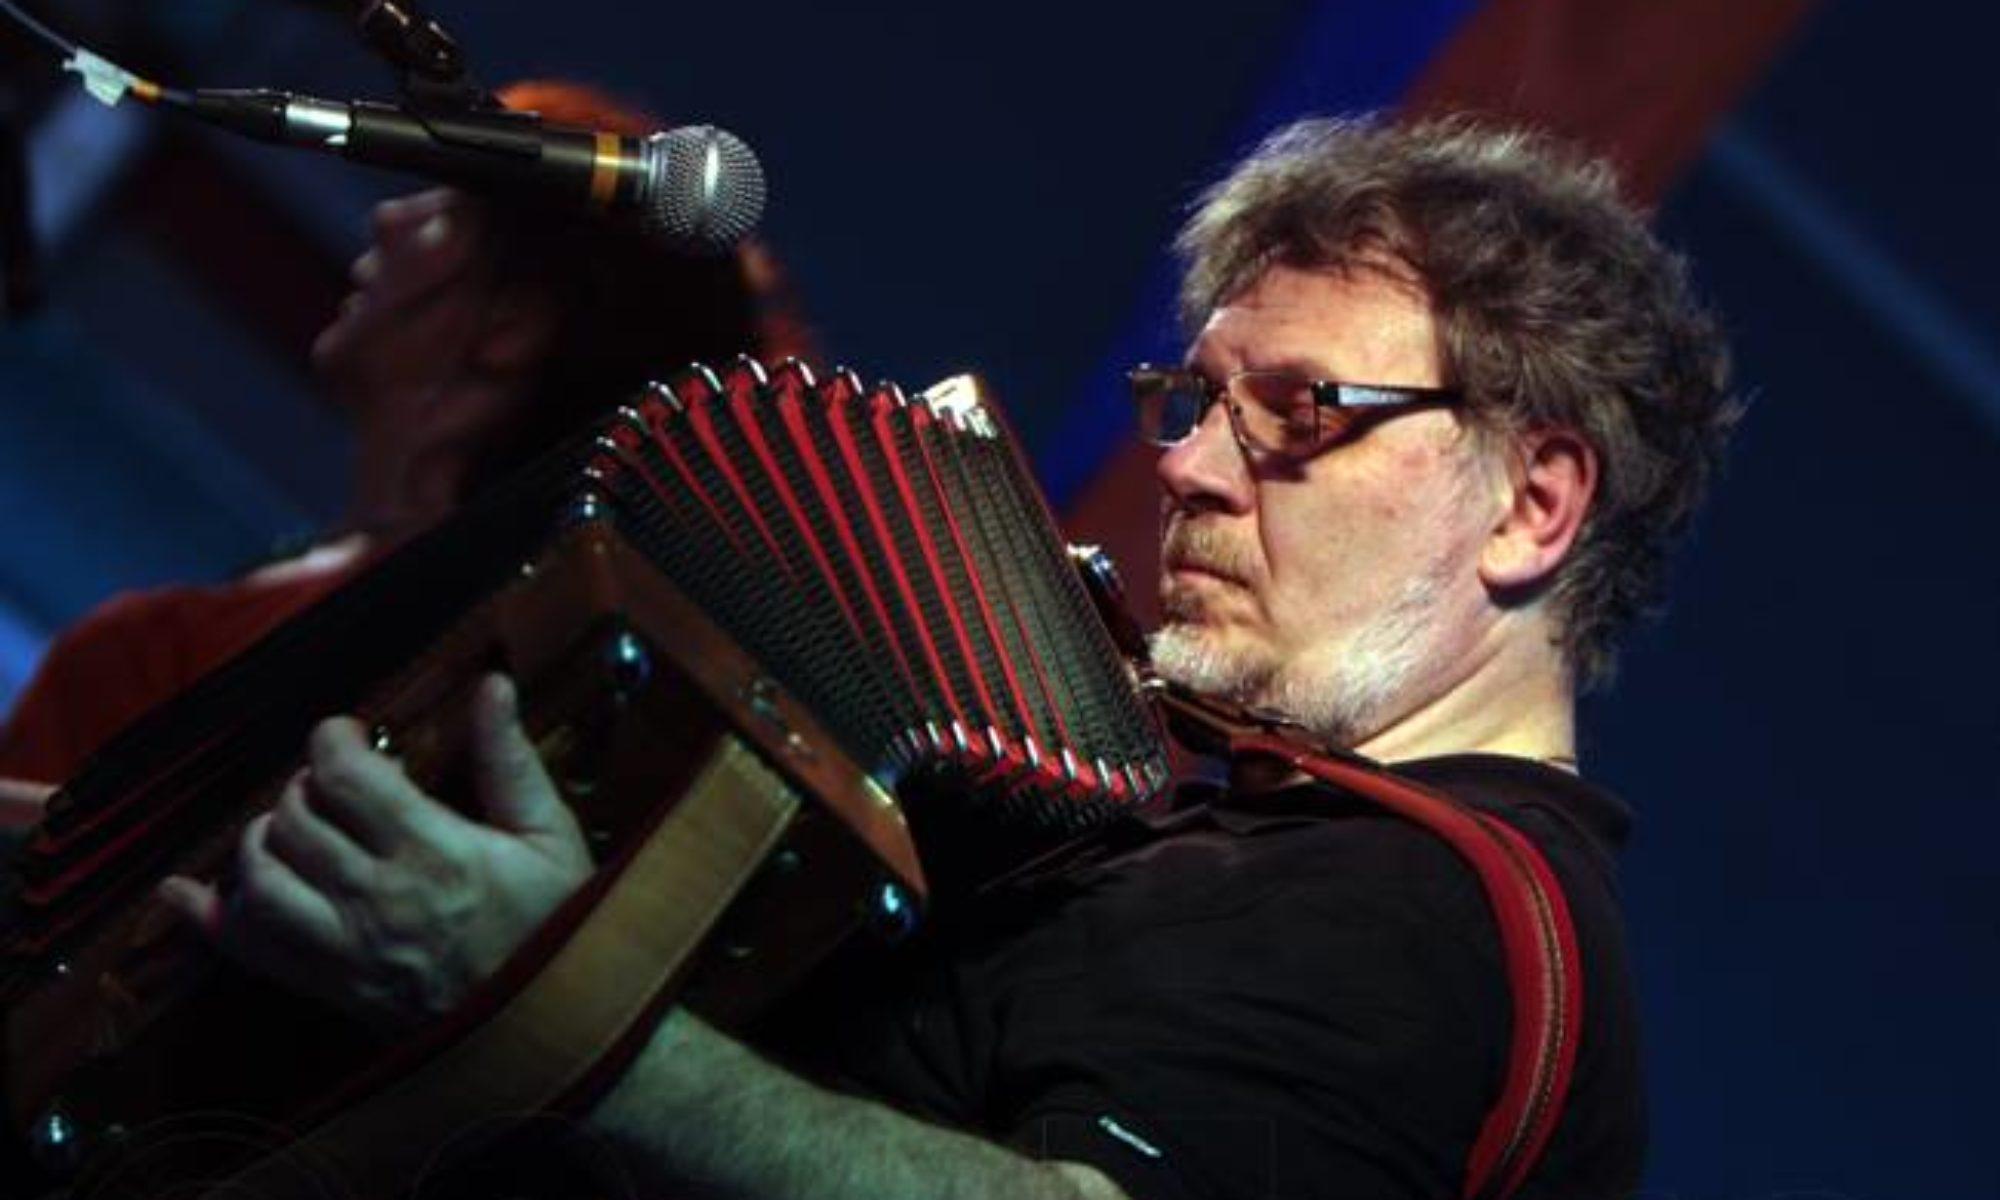 Rinaldo Doro